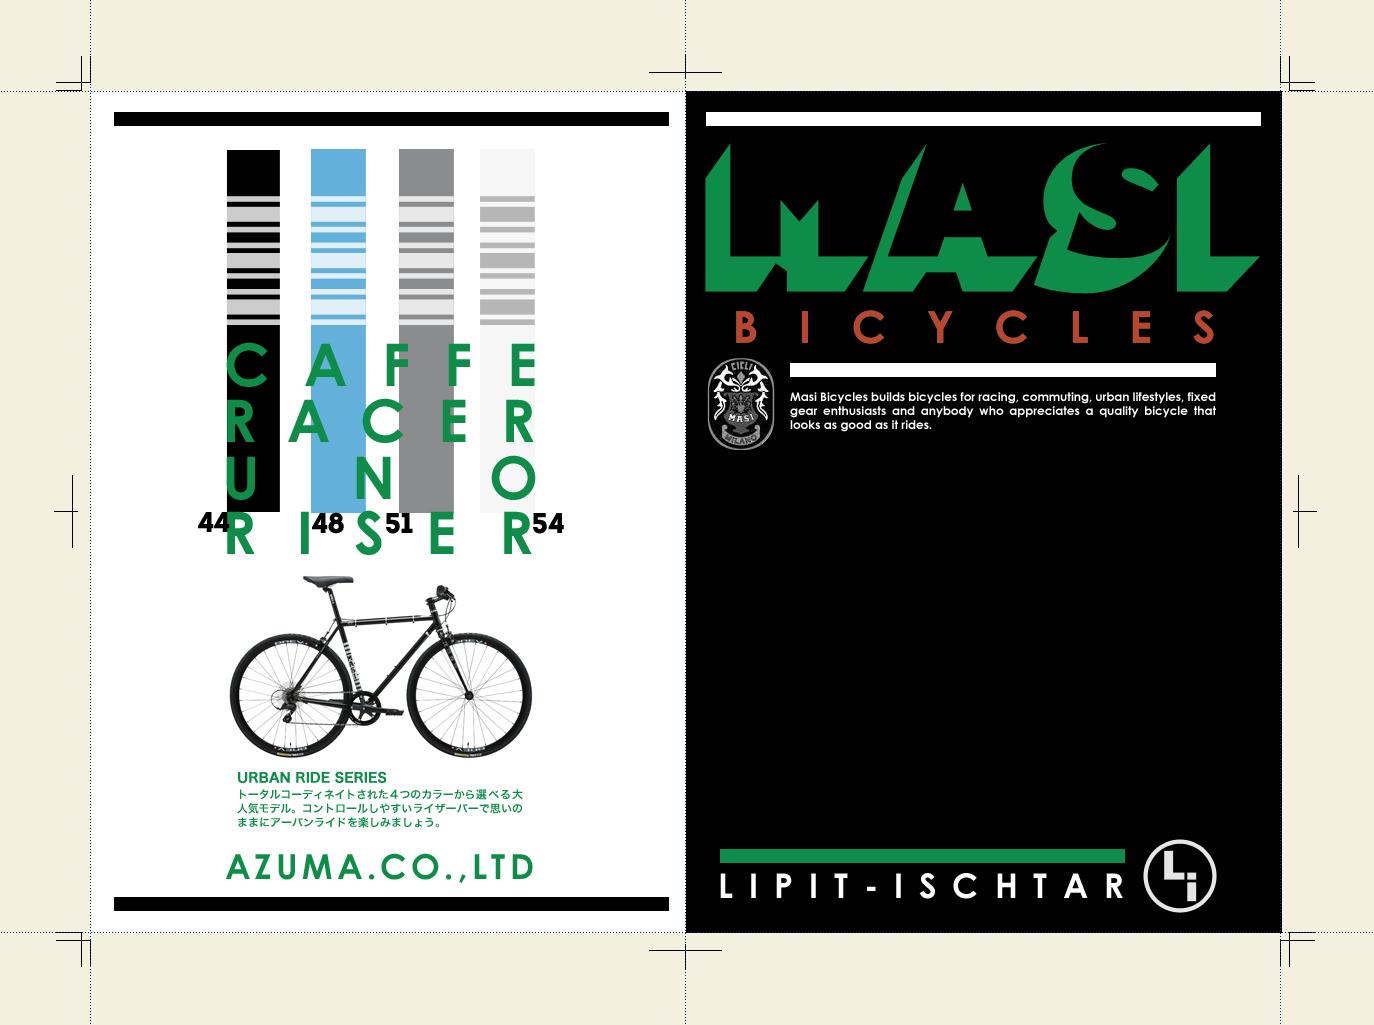 MASI マジィ CAFFE RACER UNO RISER 2015 カフェレーサーウノライザー クロスバイク おしゃれ 自転車 女子_b0212032_19292452.jpg